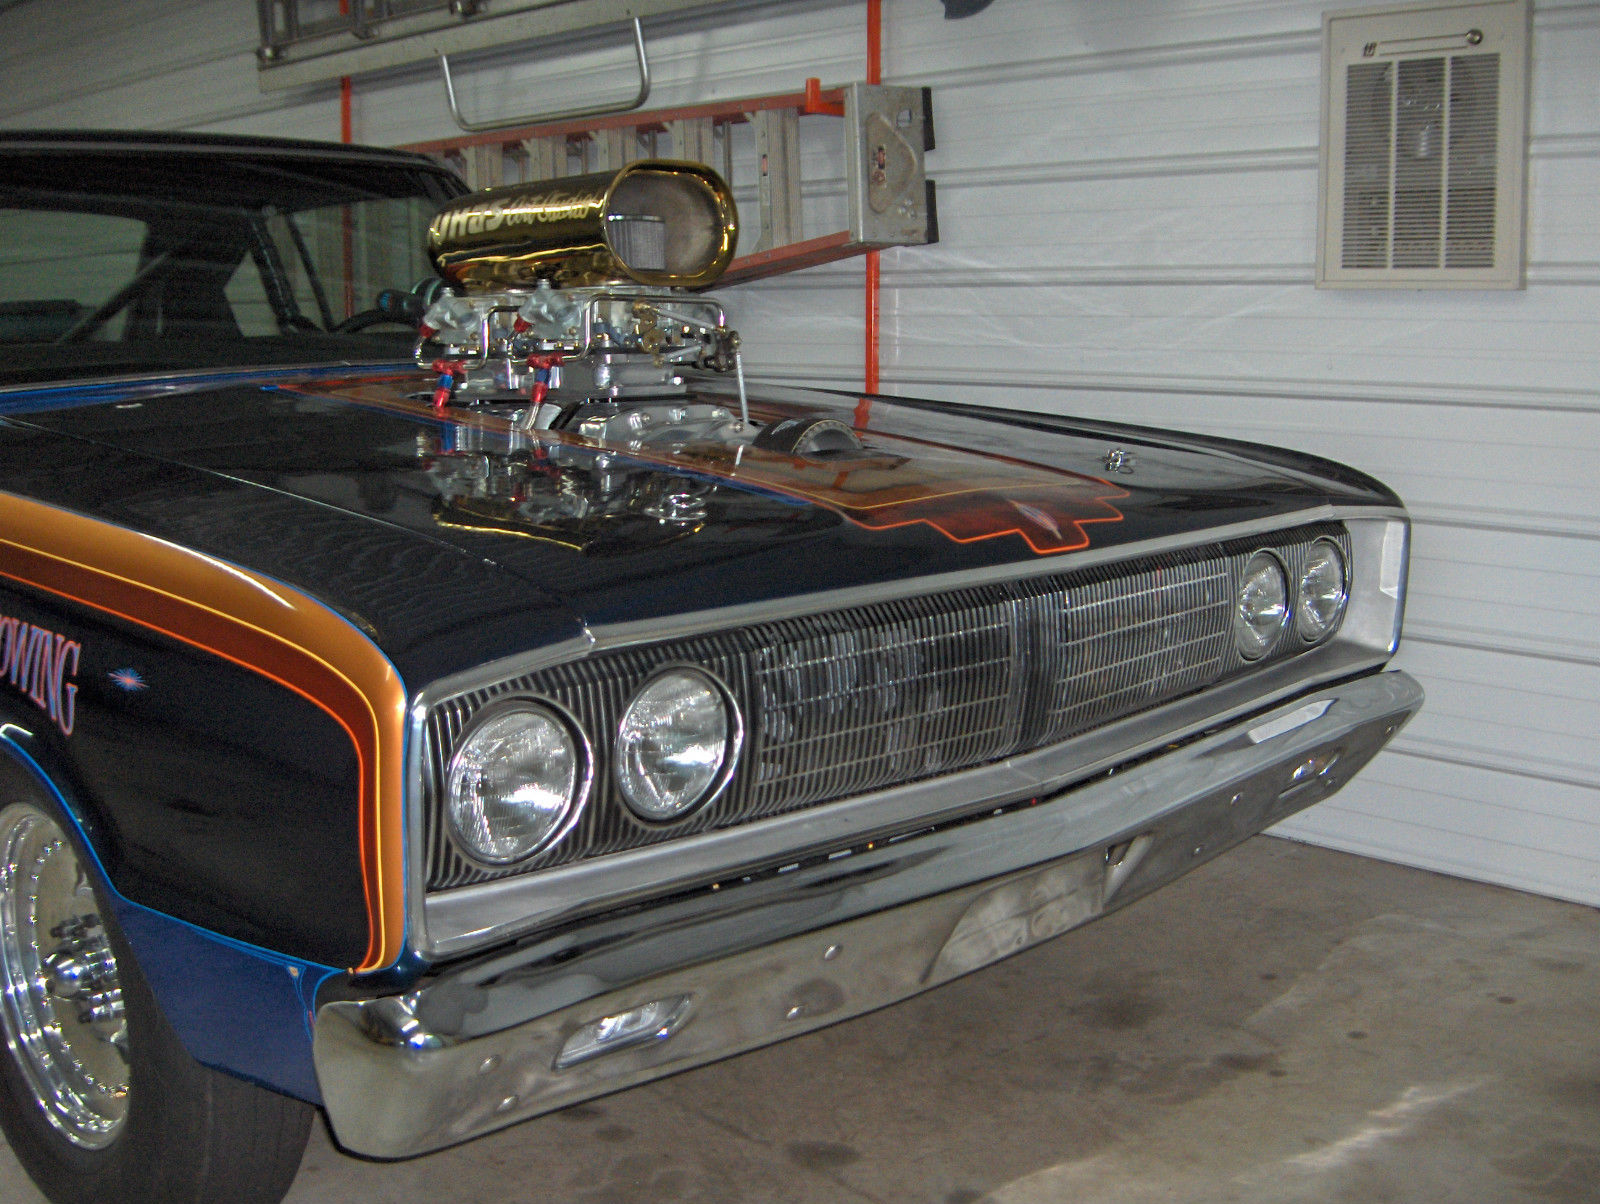 1967 CORONET RT KEITH BLACK 426 BLOWN HEMI - Classic Dodge ...